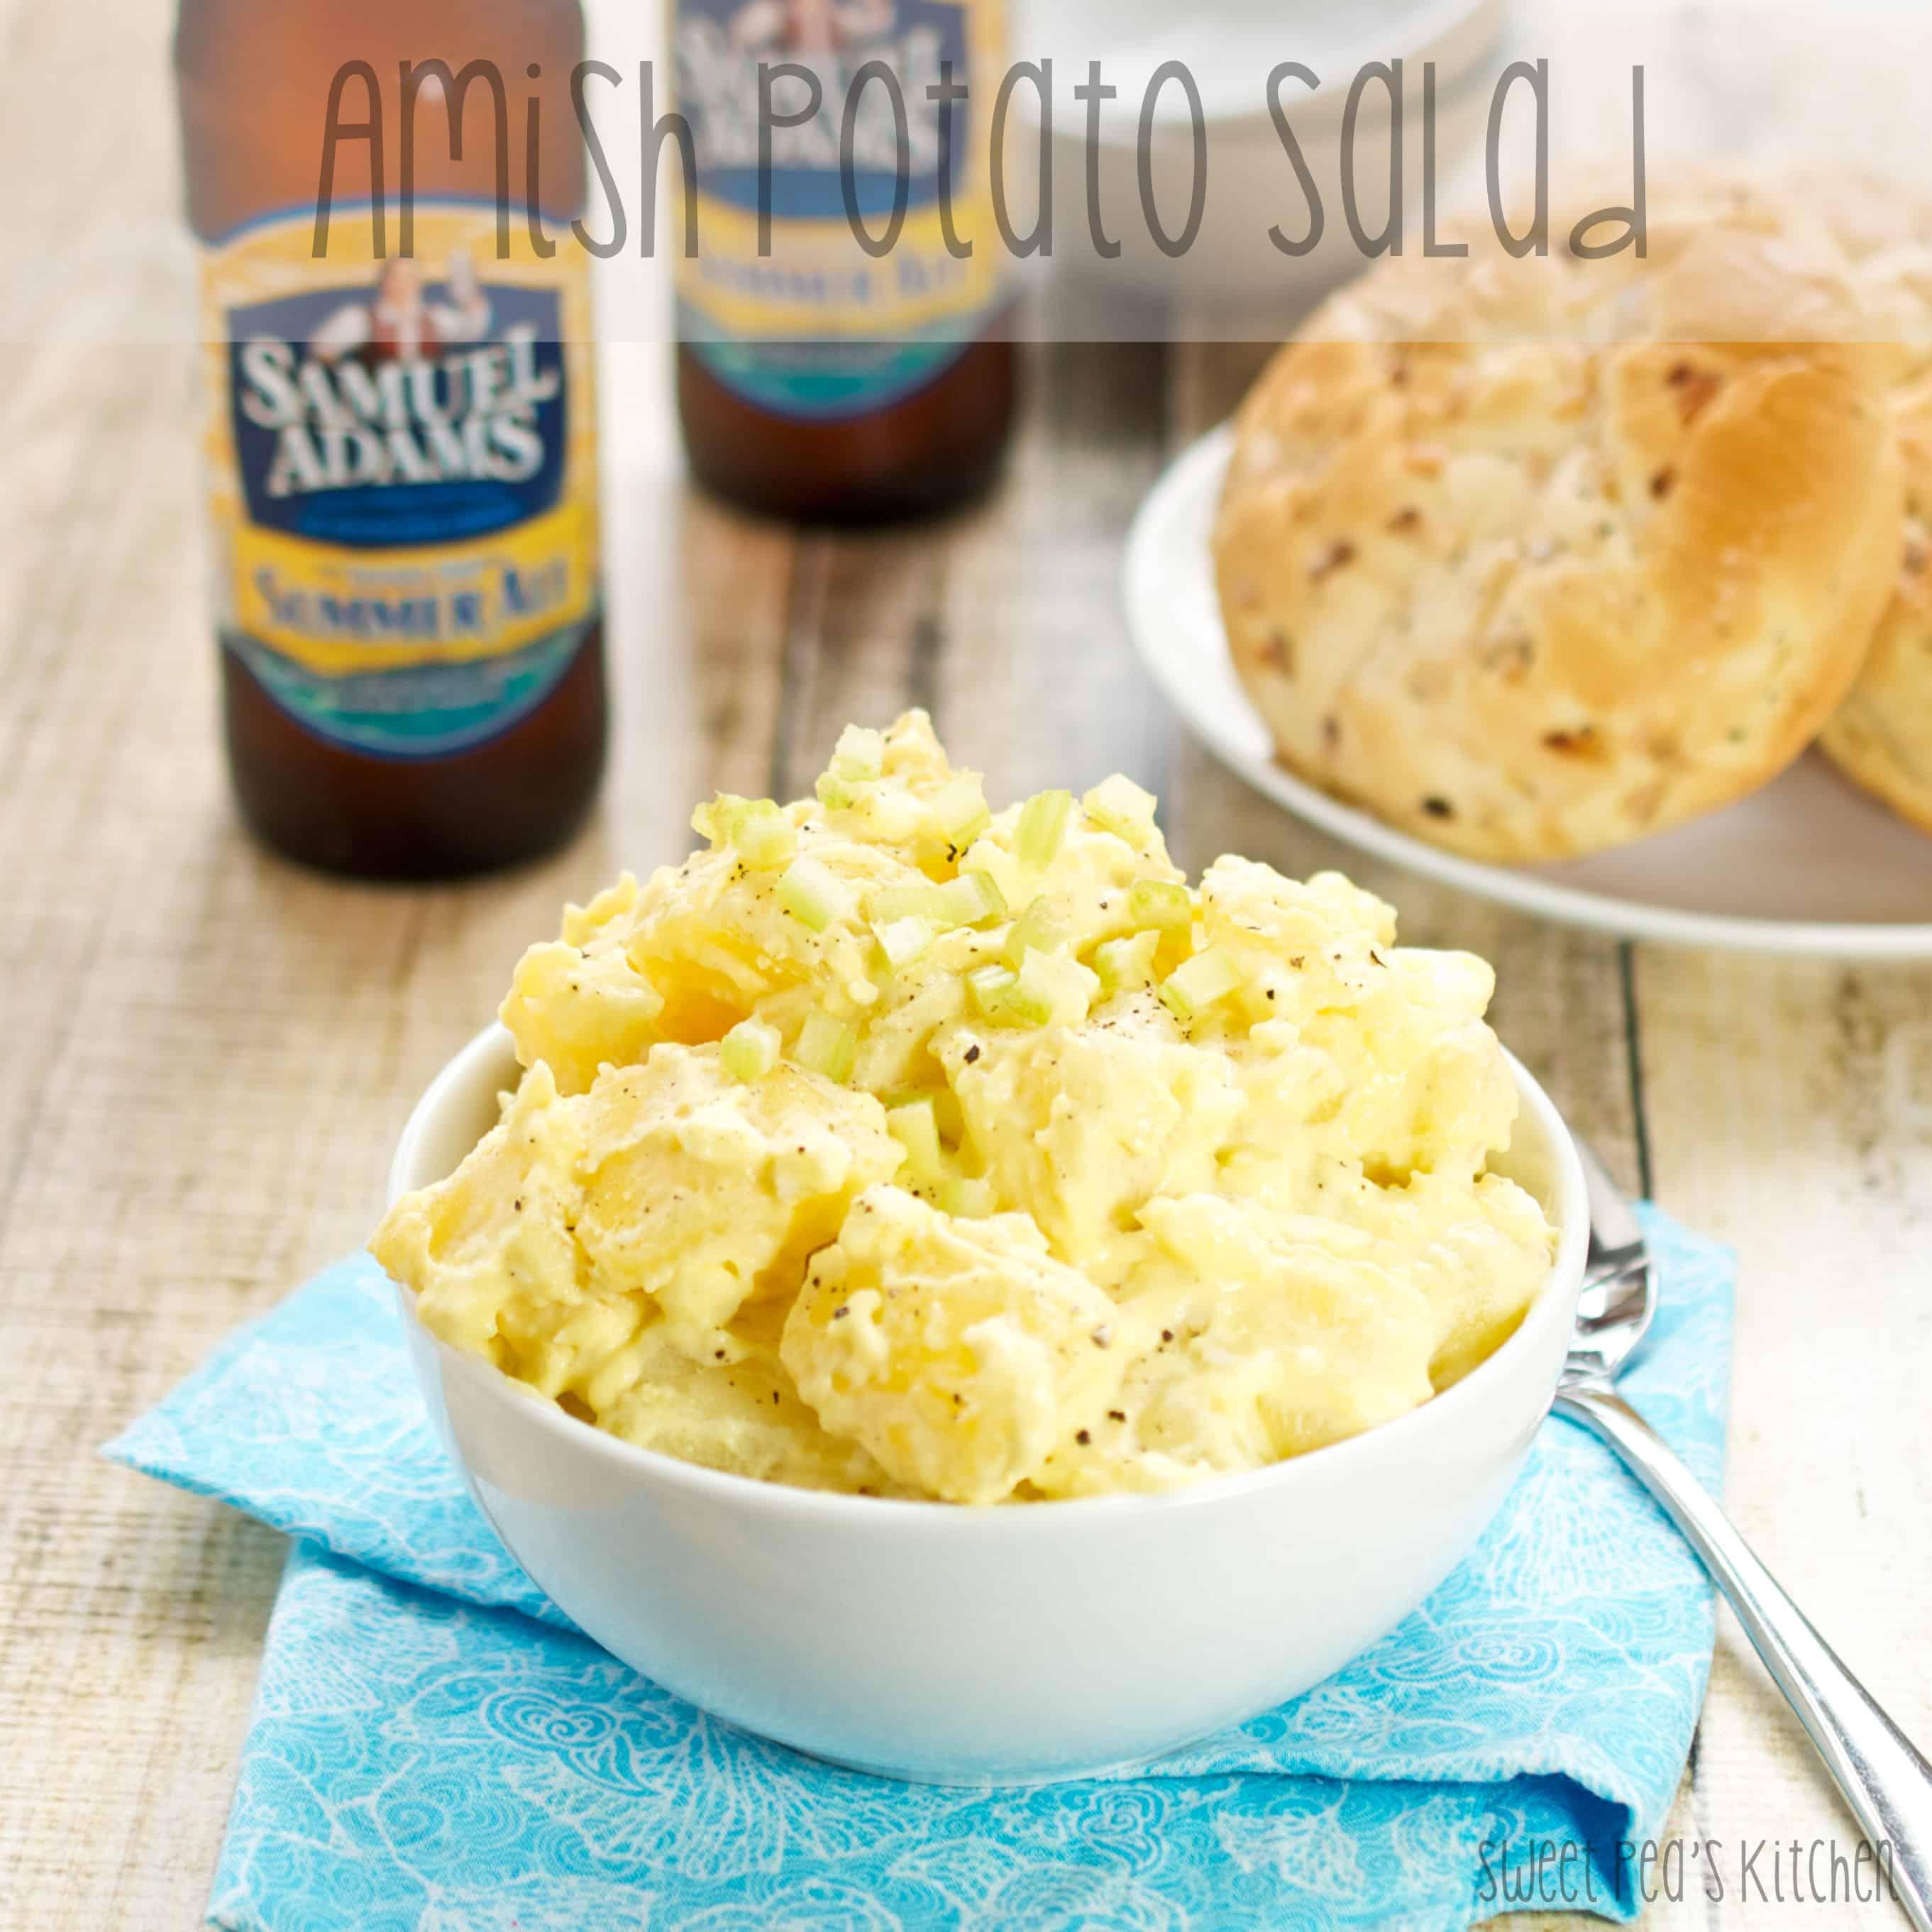 ready to serve amish potato salad